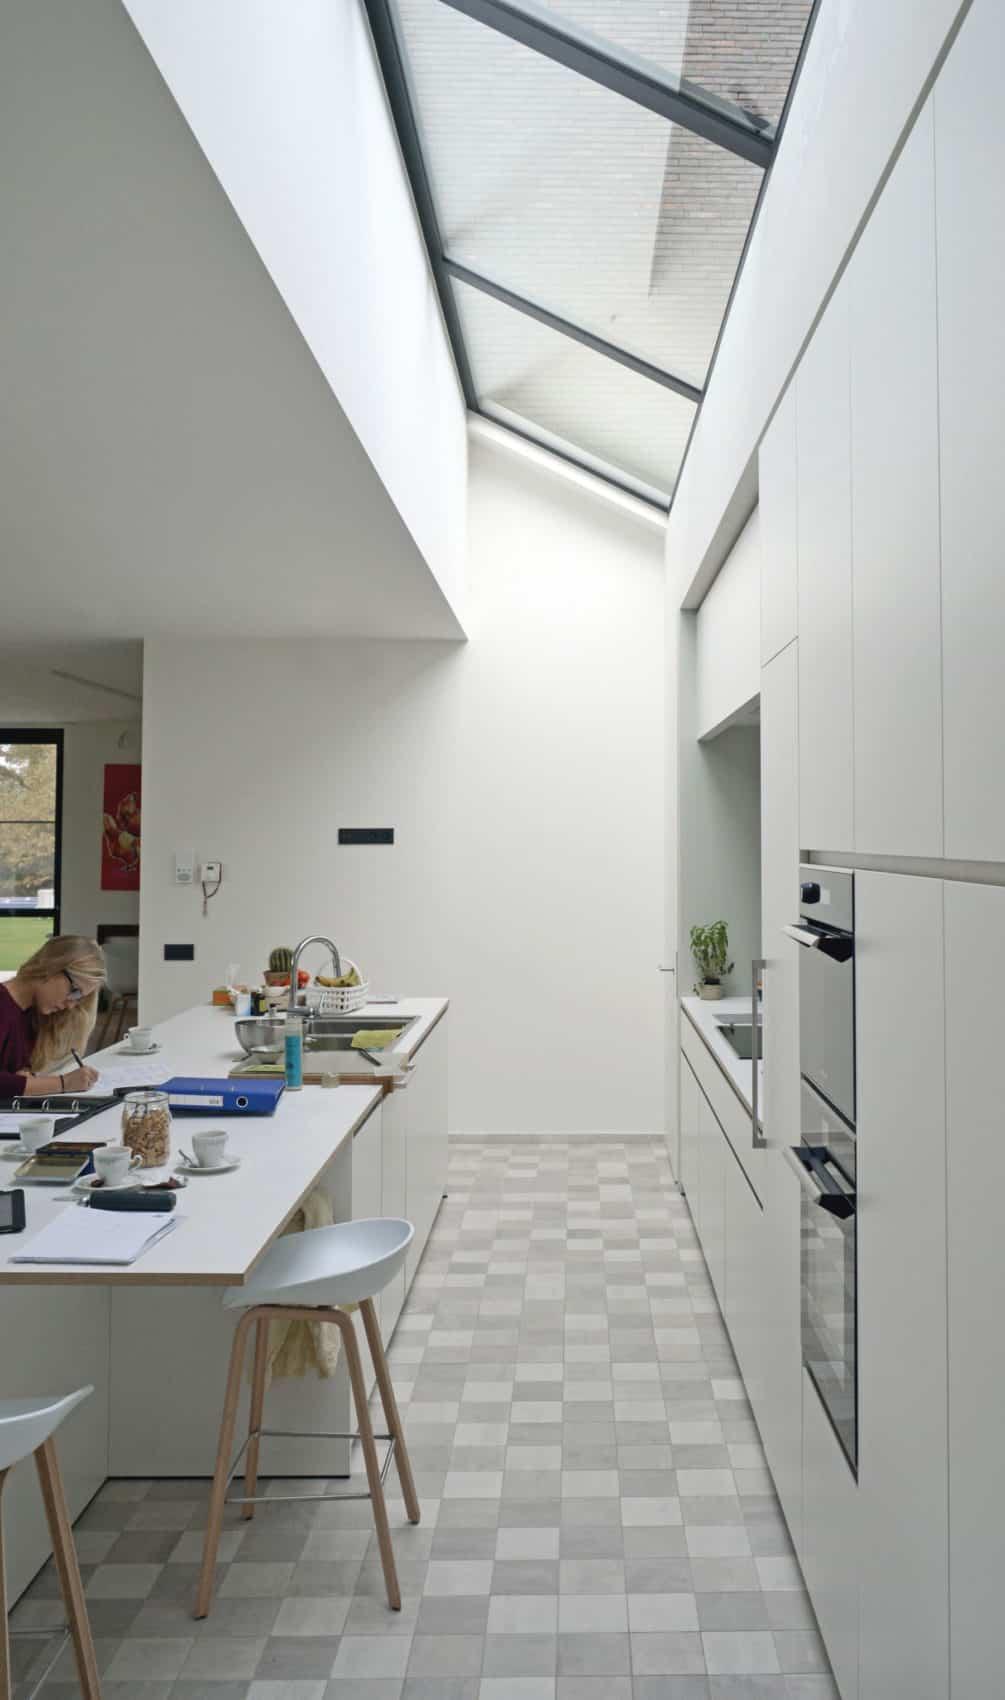 F&C Kiekens by Architektuurburo Dirk Hulpia (19)